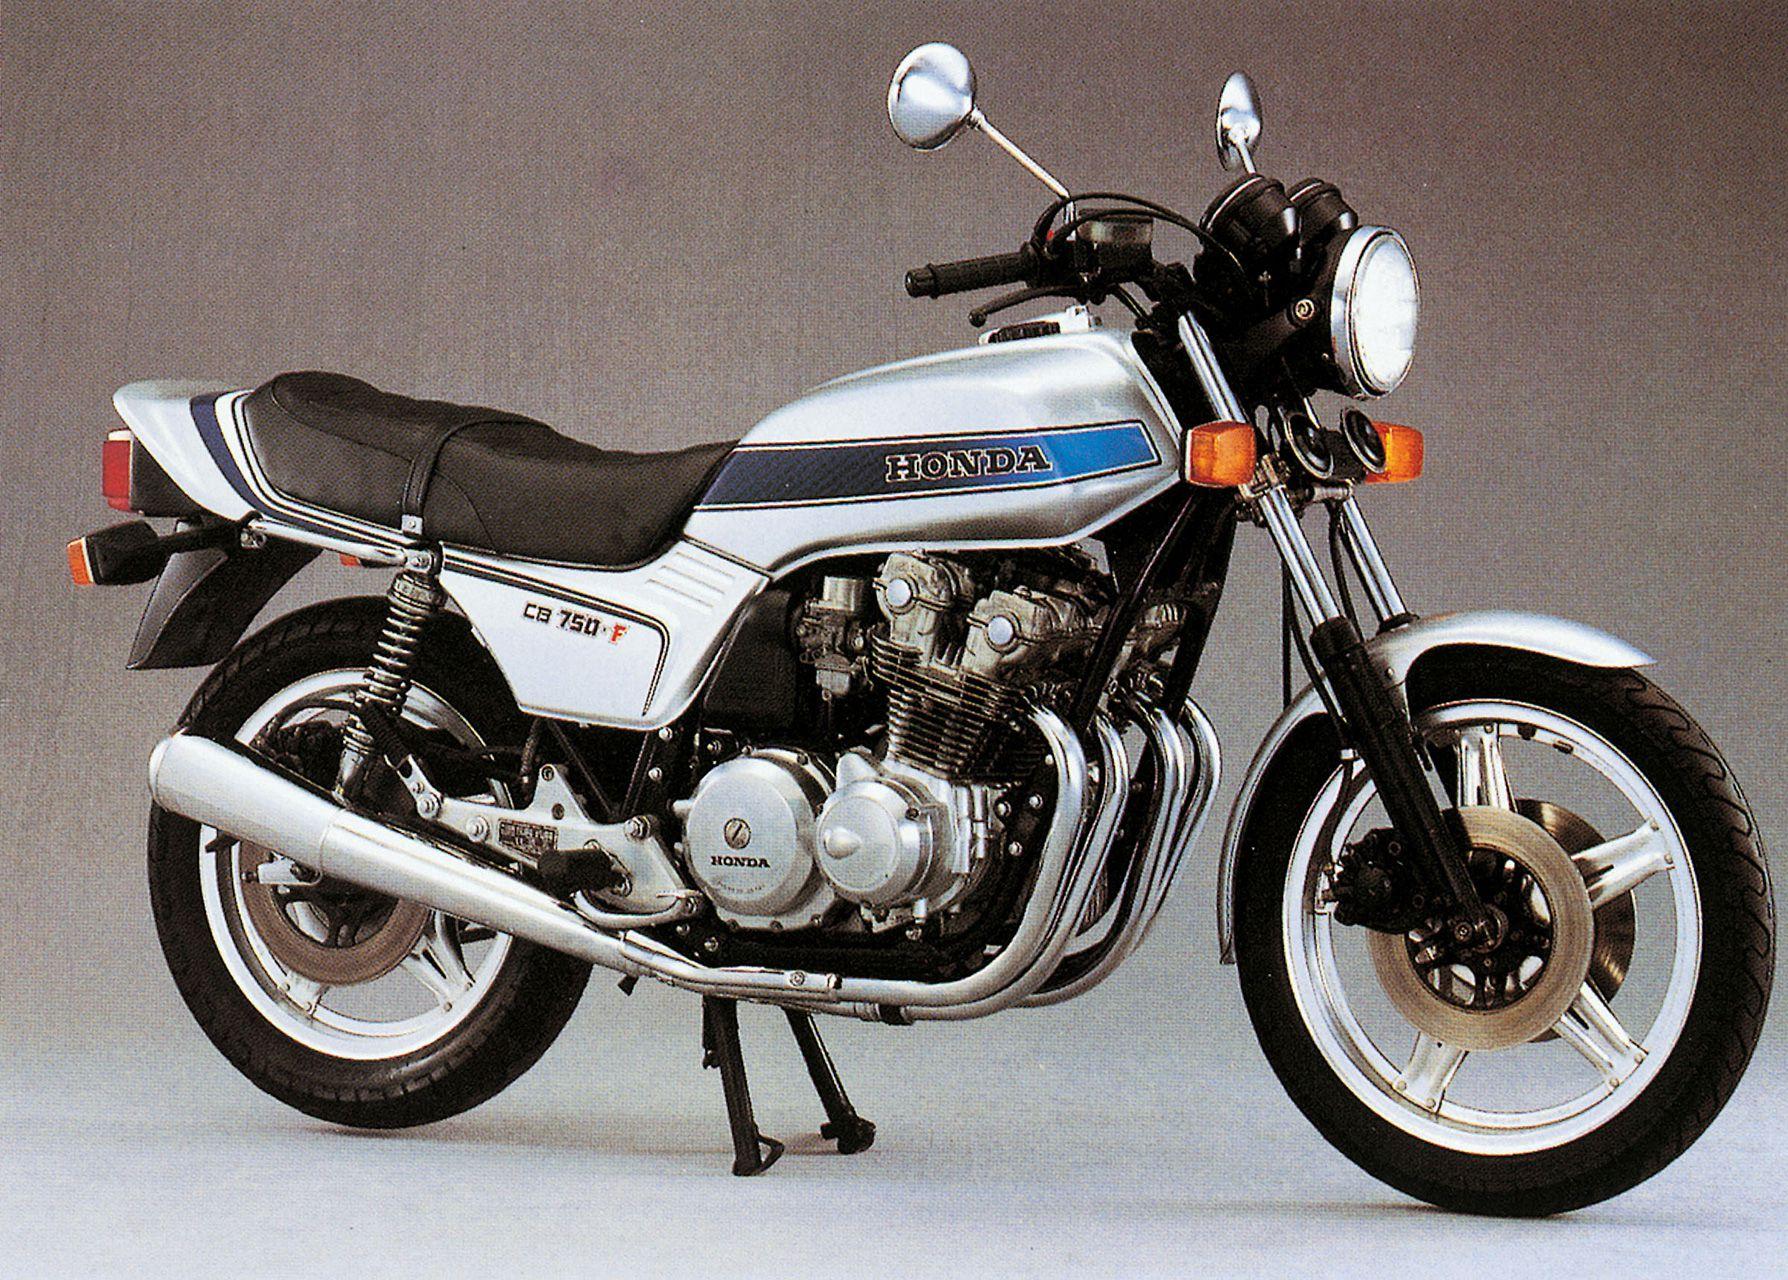 hight resolution of honda cb750 cb900 and cb1100 classics remembered